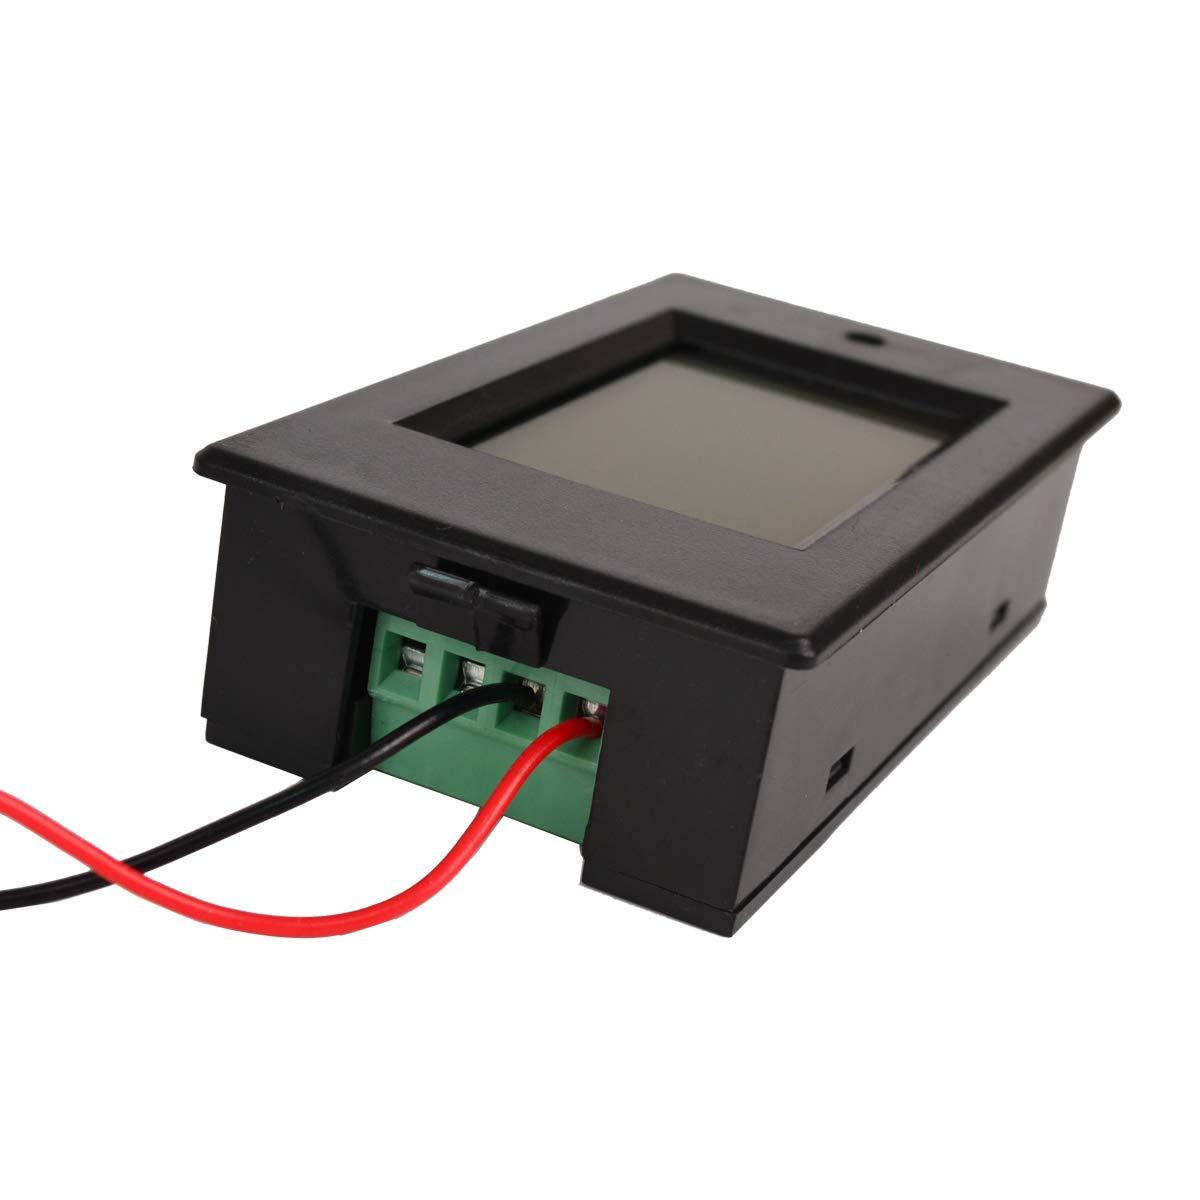 Baitaihem AC 80-260V 100A LCD Display Digital Current Voltage Power Energy Meter Multimeter Ammeter Voltmeter by Baitaihem (Image #5)